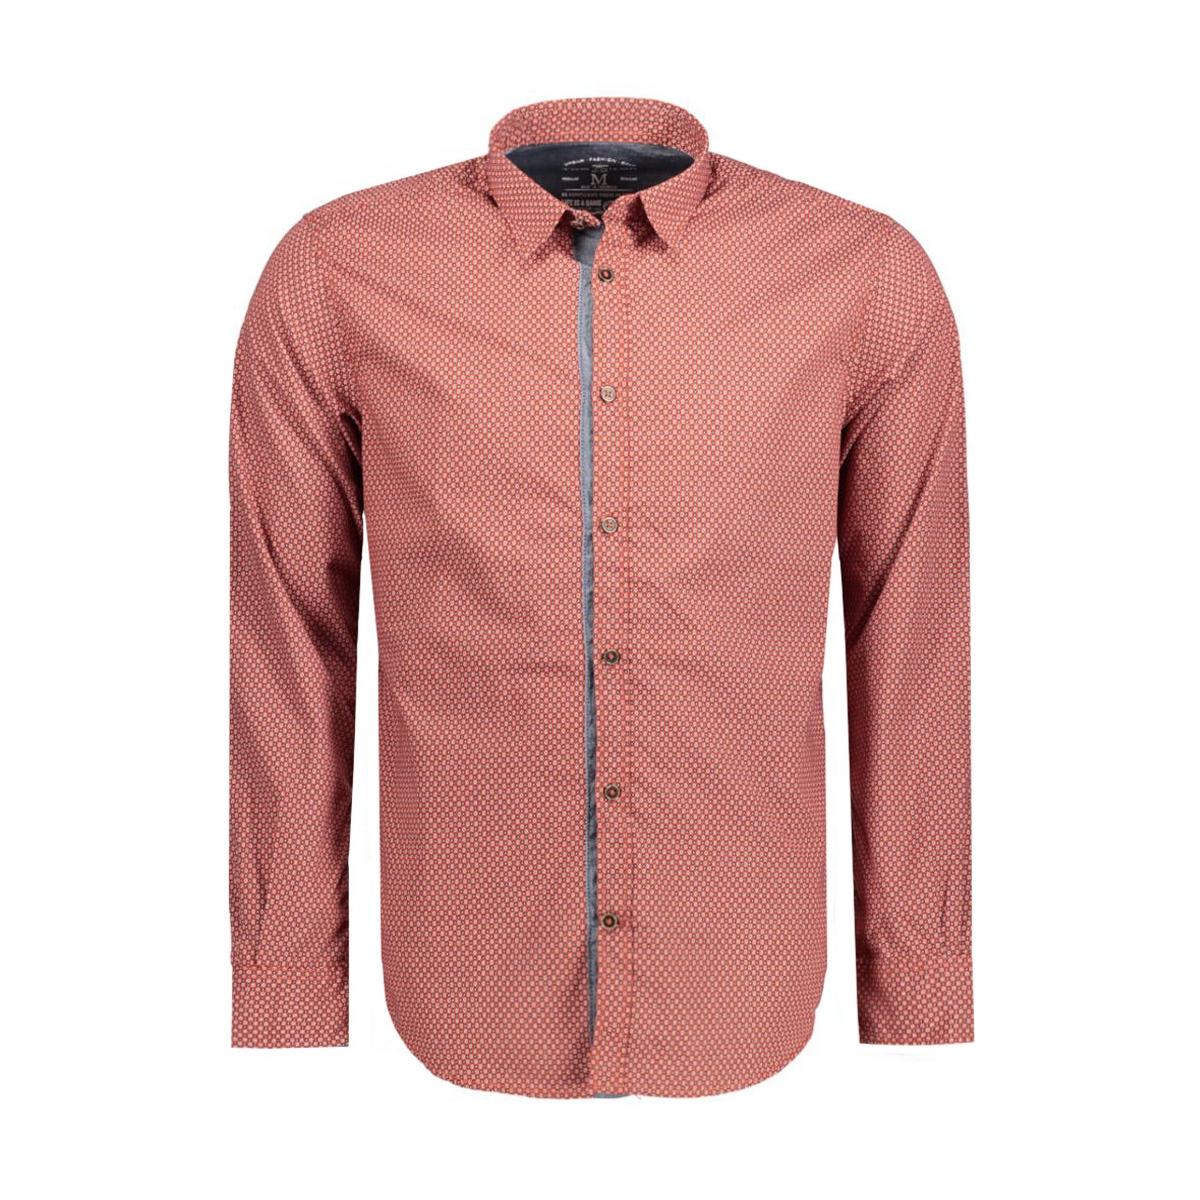 2032553.00.10 tom tailor overhemd 3577